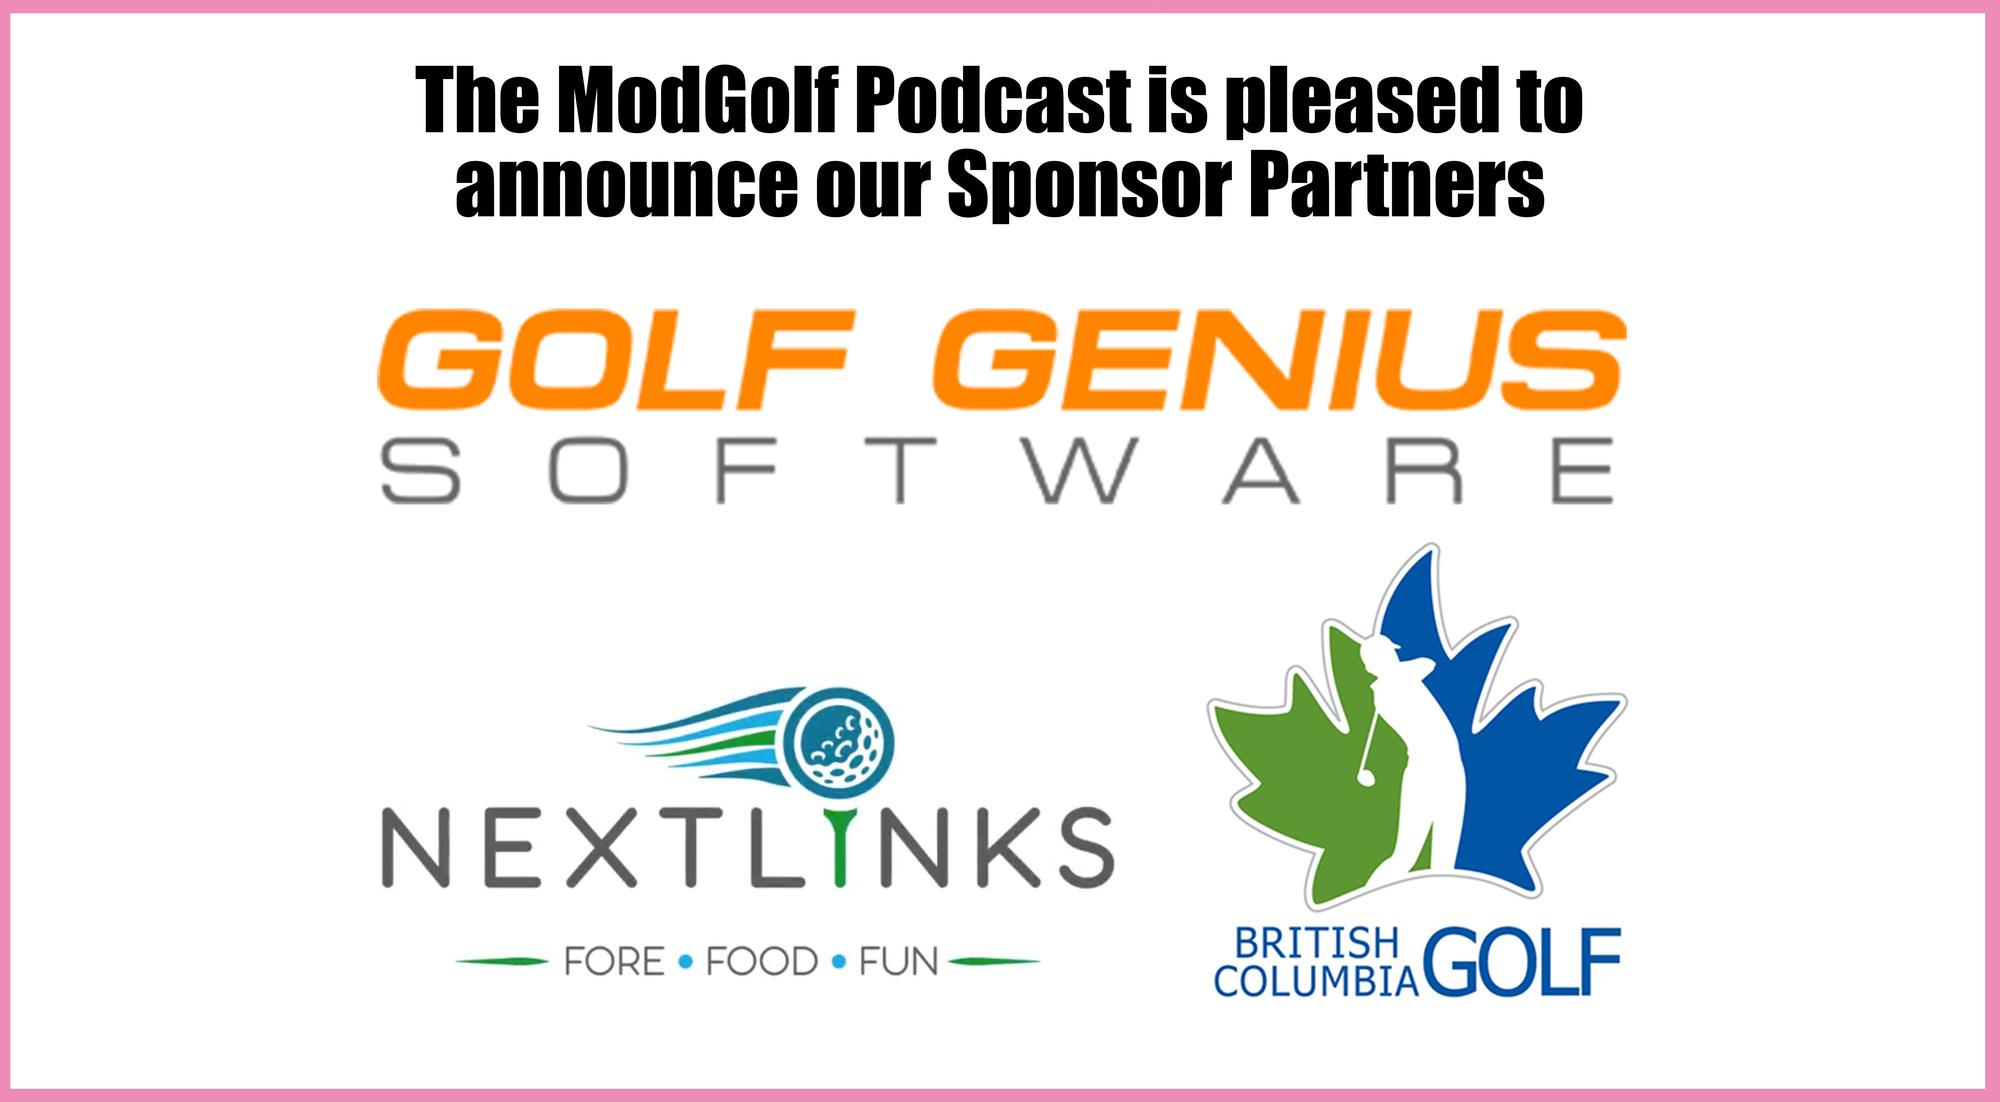 Sponsor Partners